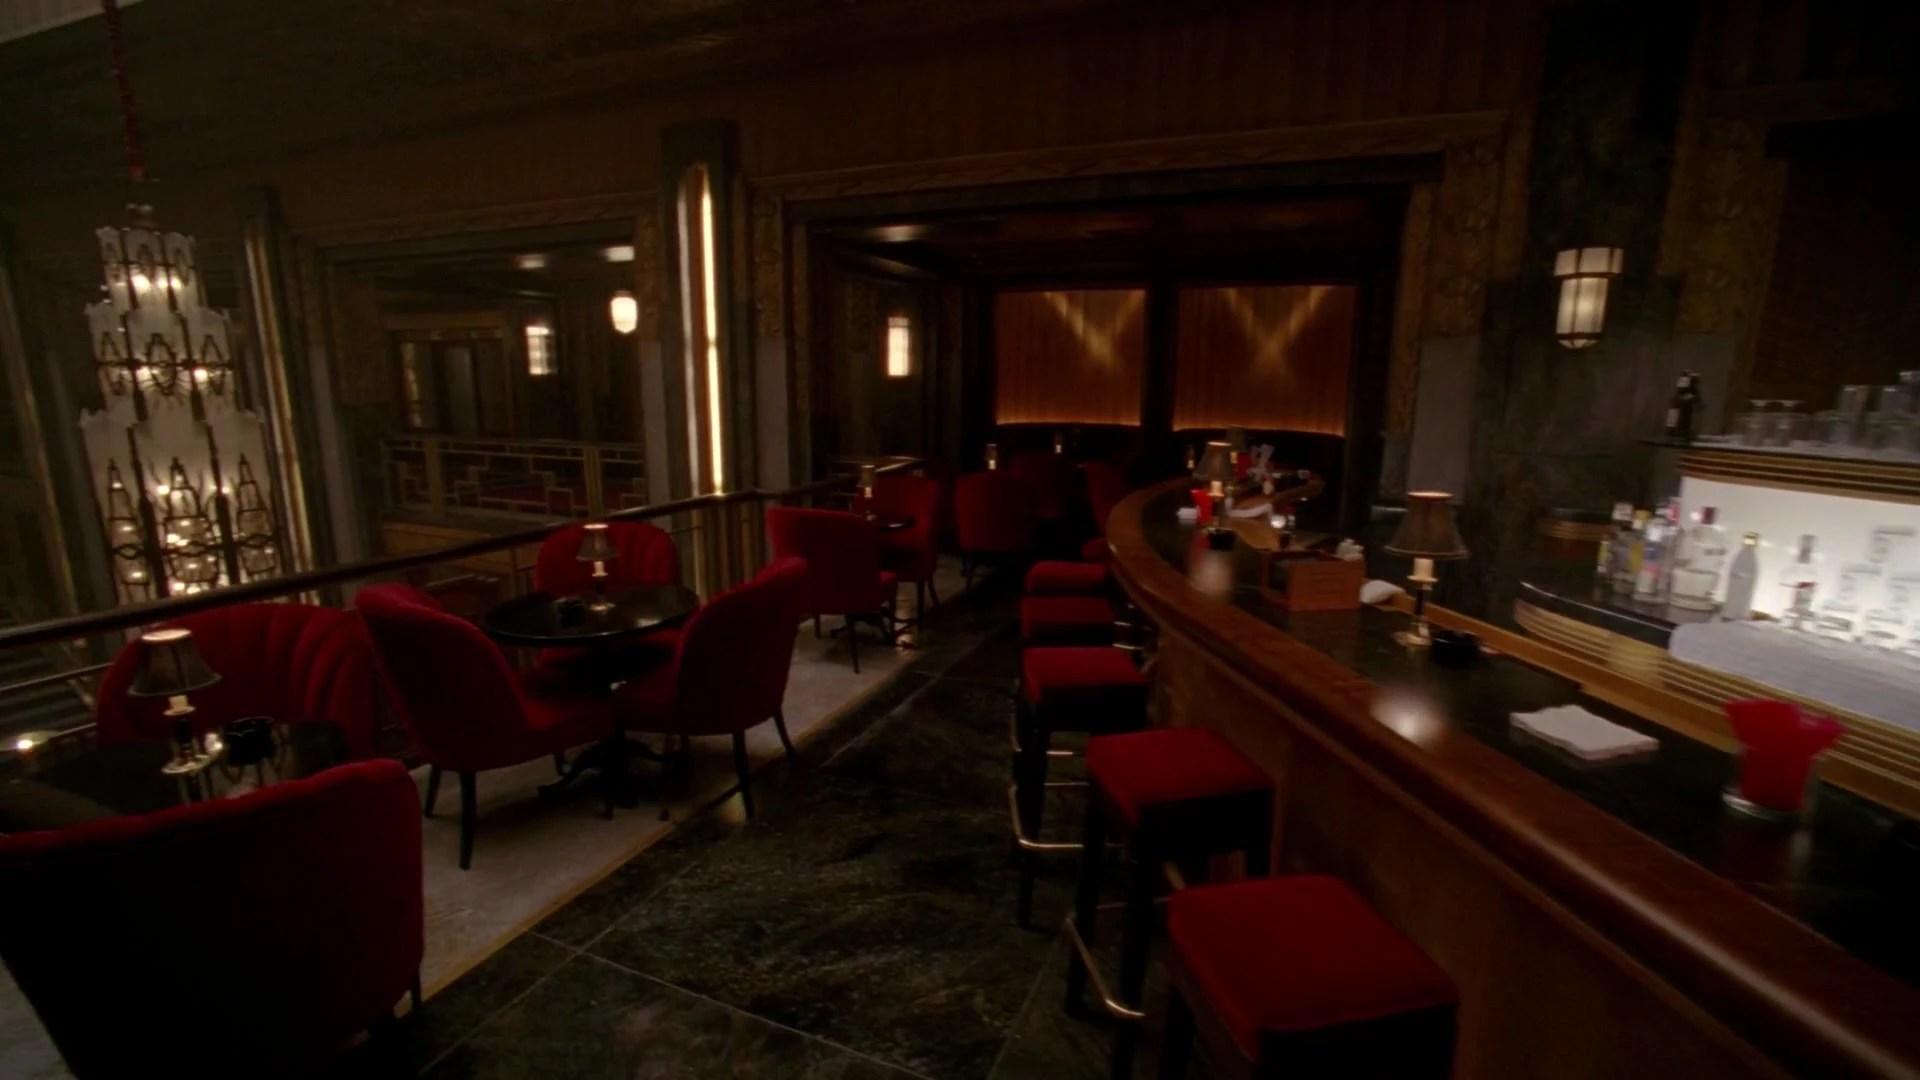 Hotel Cortez American Horror Story